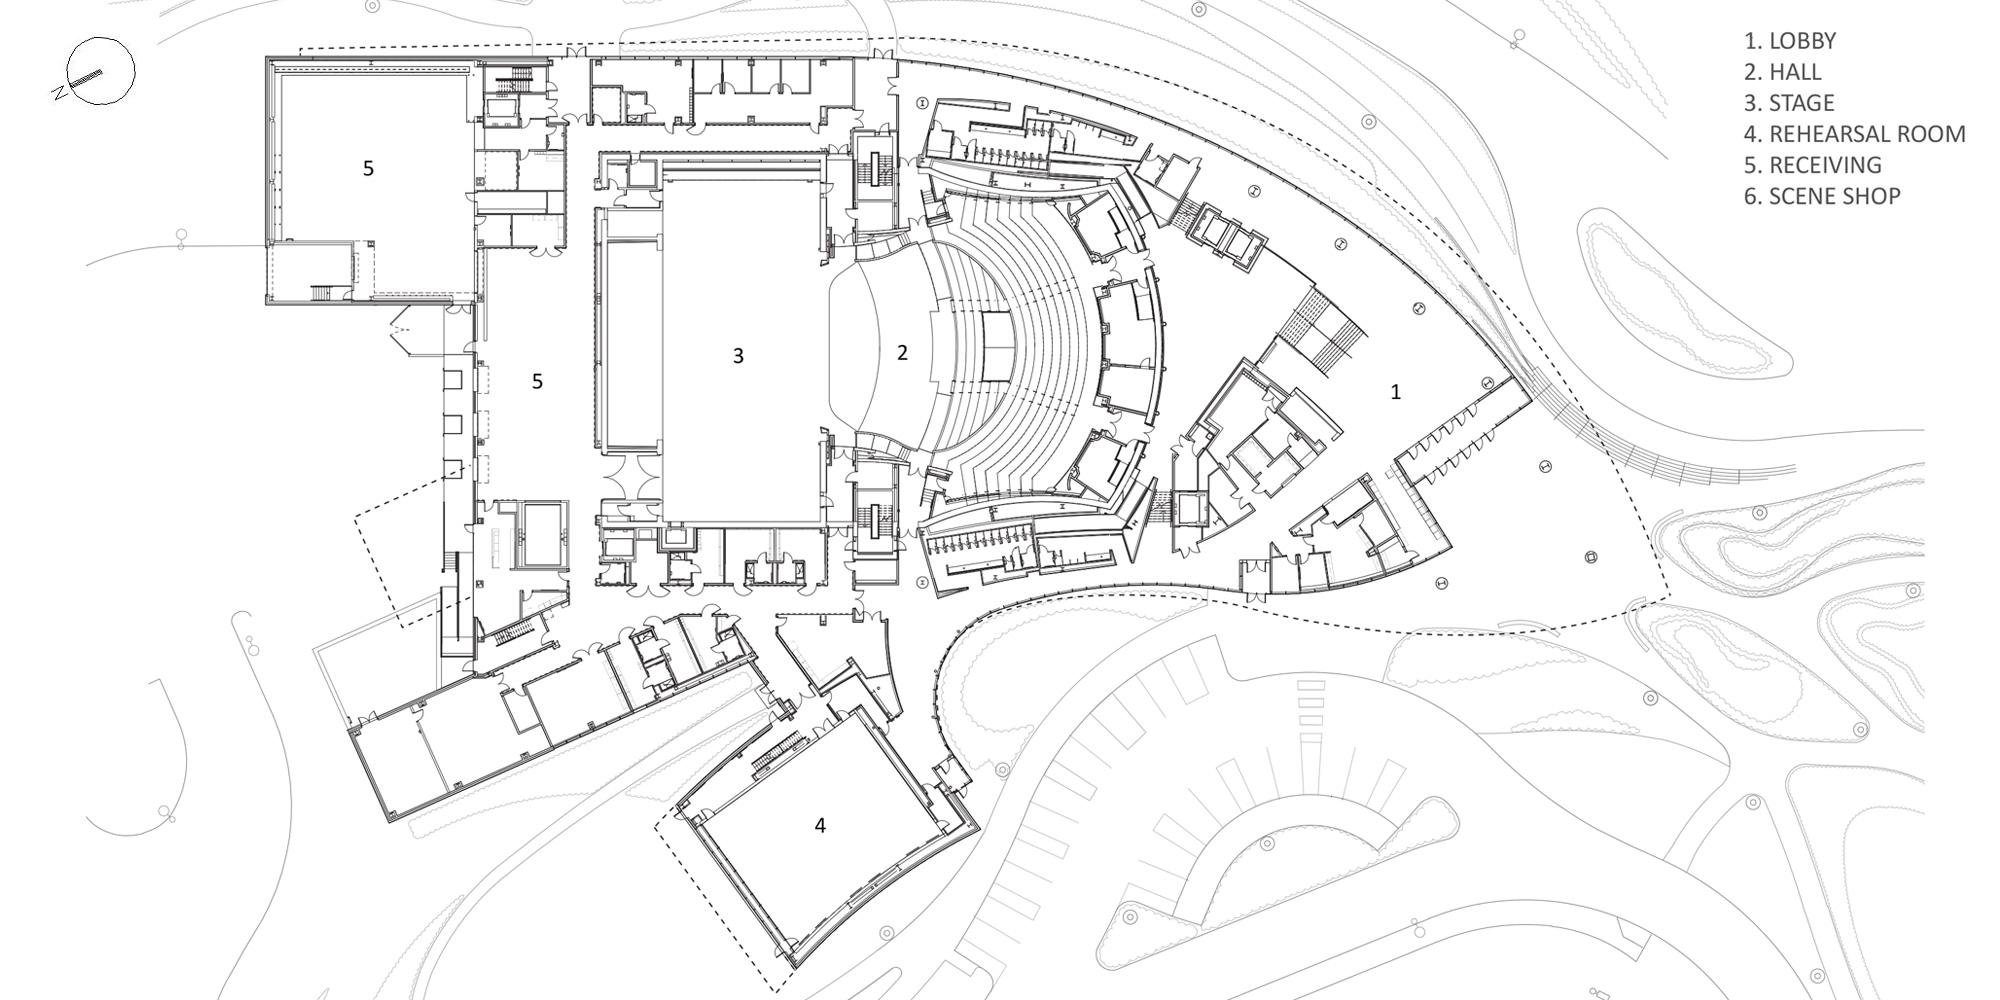 Level 1 Plan © Pelli Clarke Pelli Architects